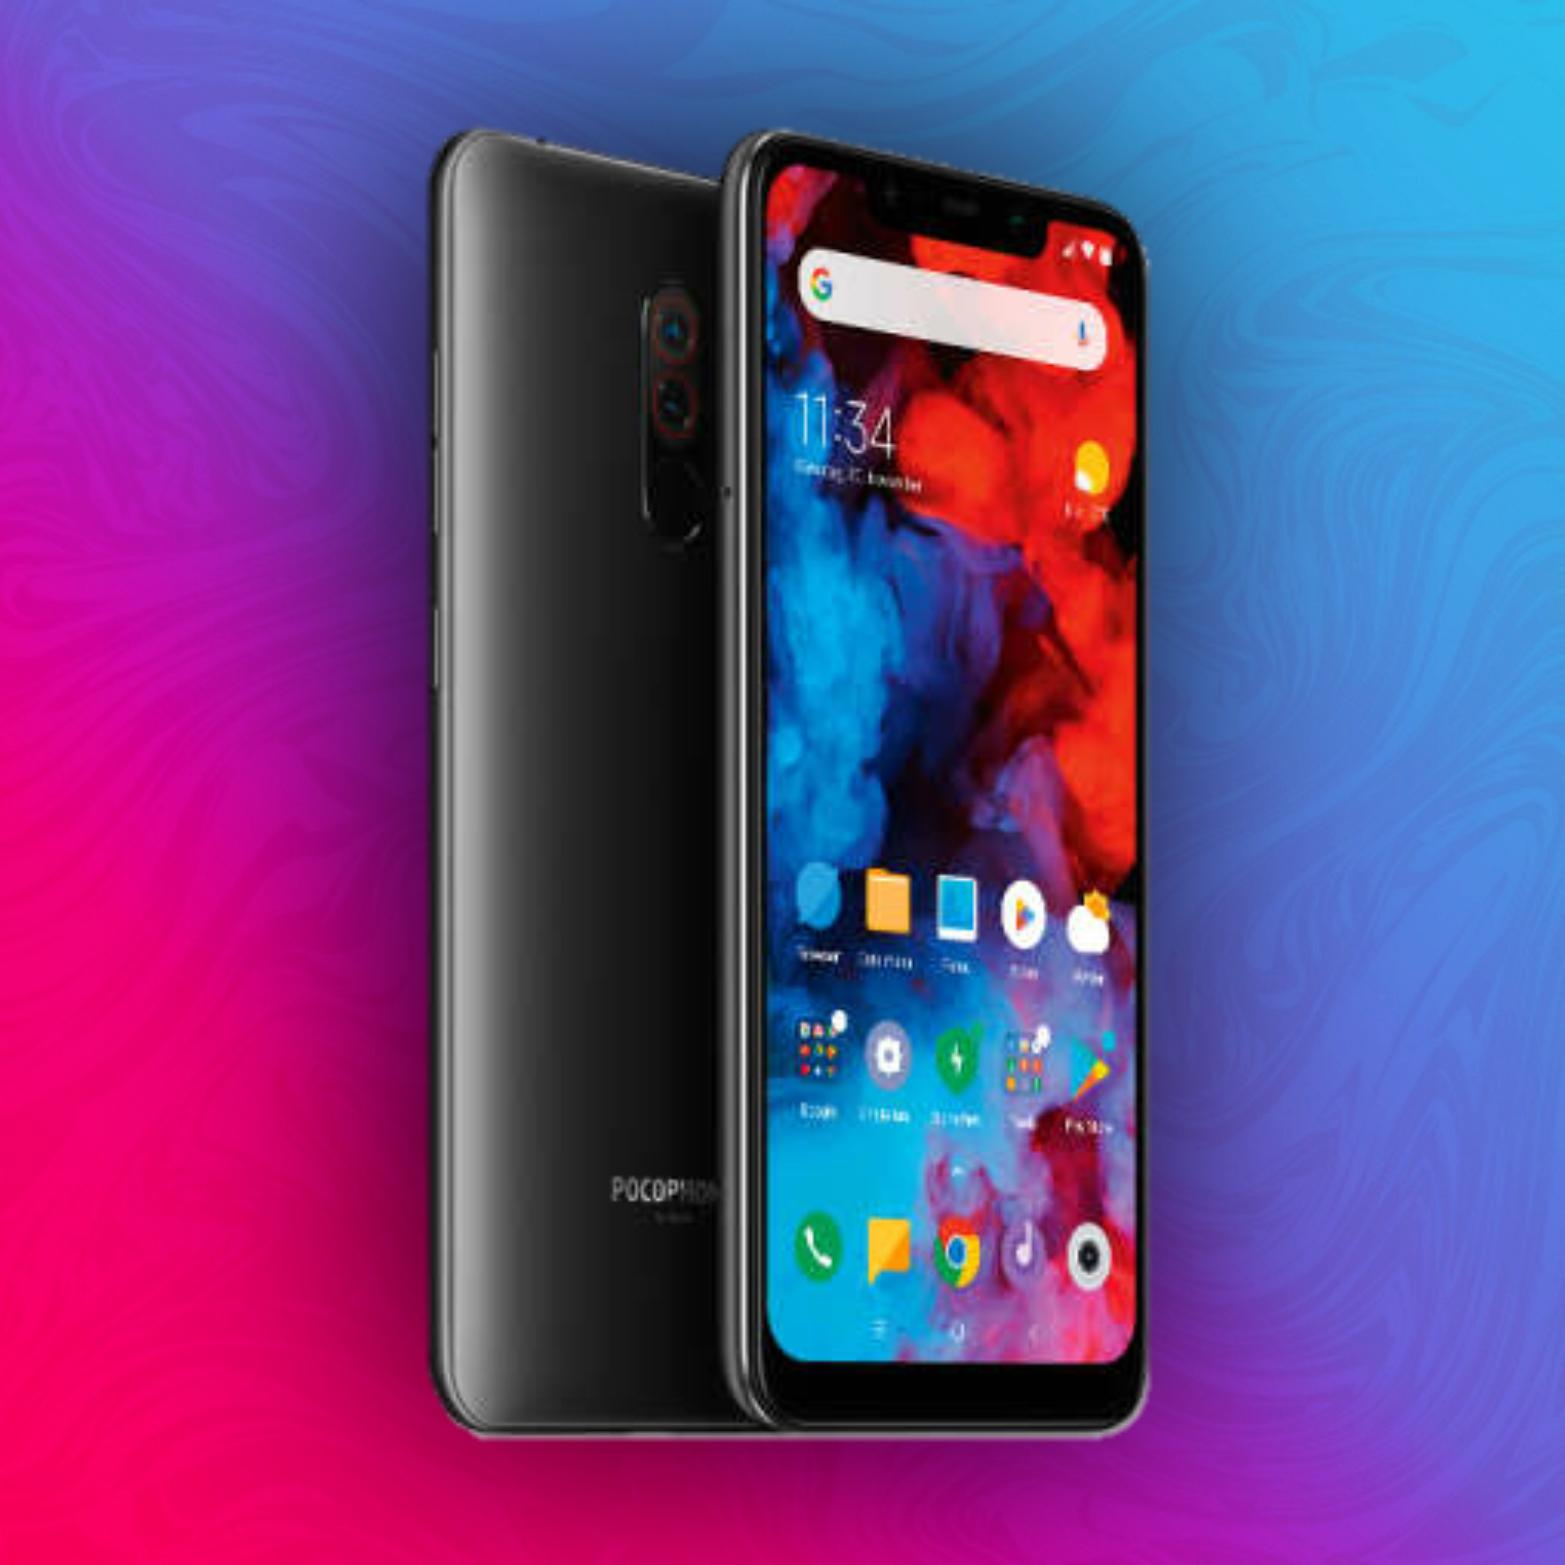 [Amazon] Xiaomi Pocophone F1 64/6GB - Snapdragon 845 - 4000mAh Akku | Global Version